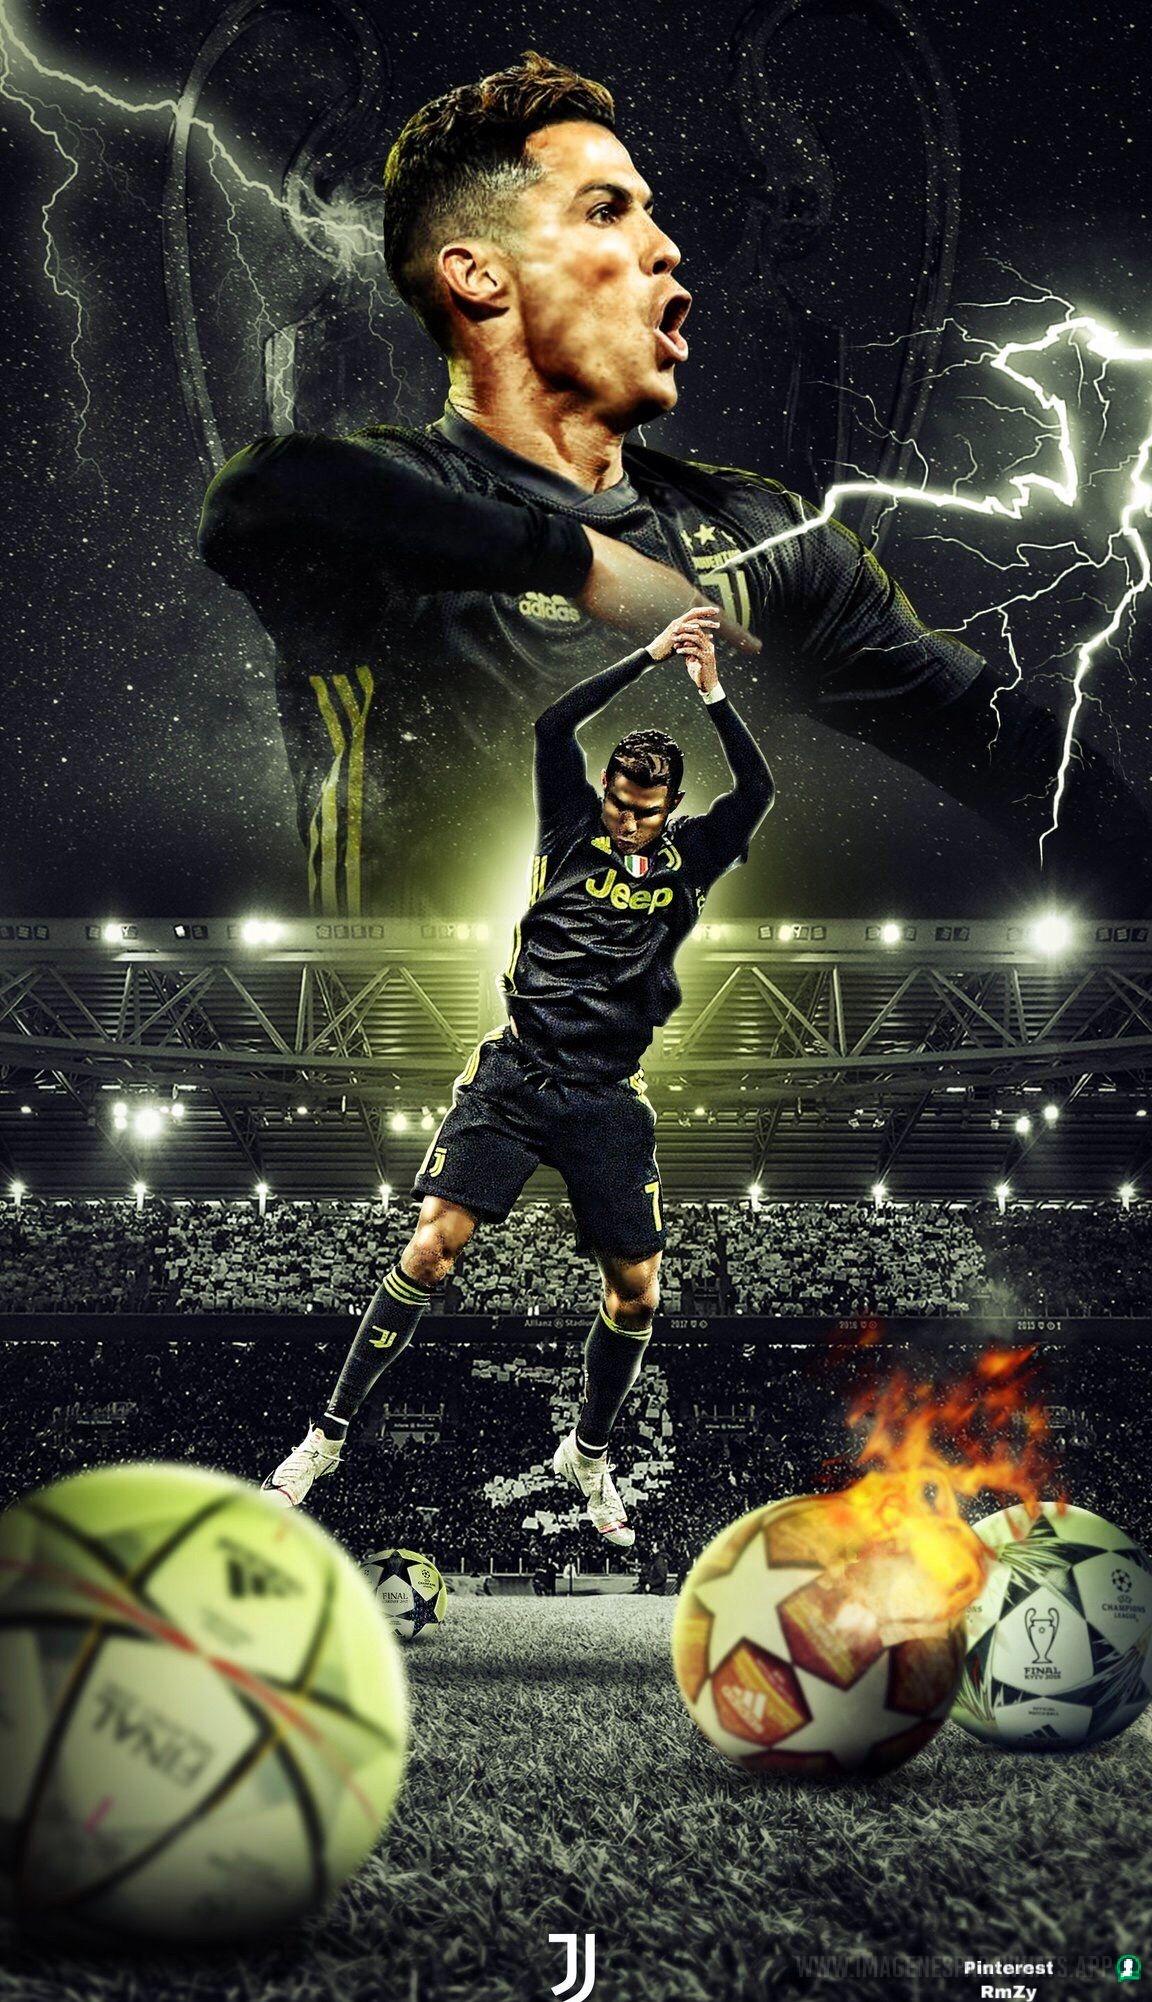 Imagenes de Futbol (1168)